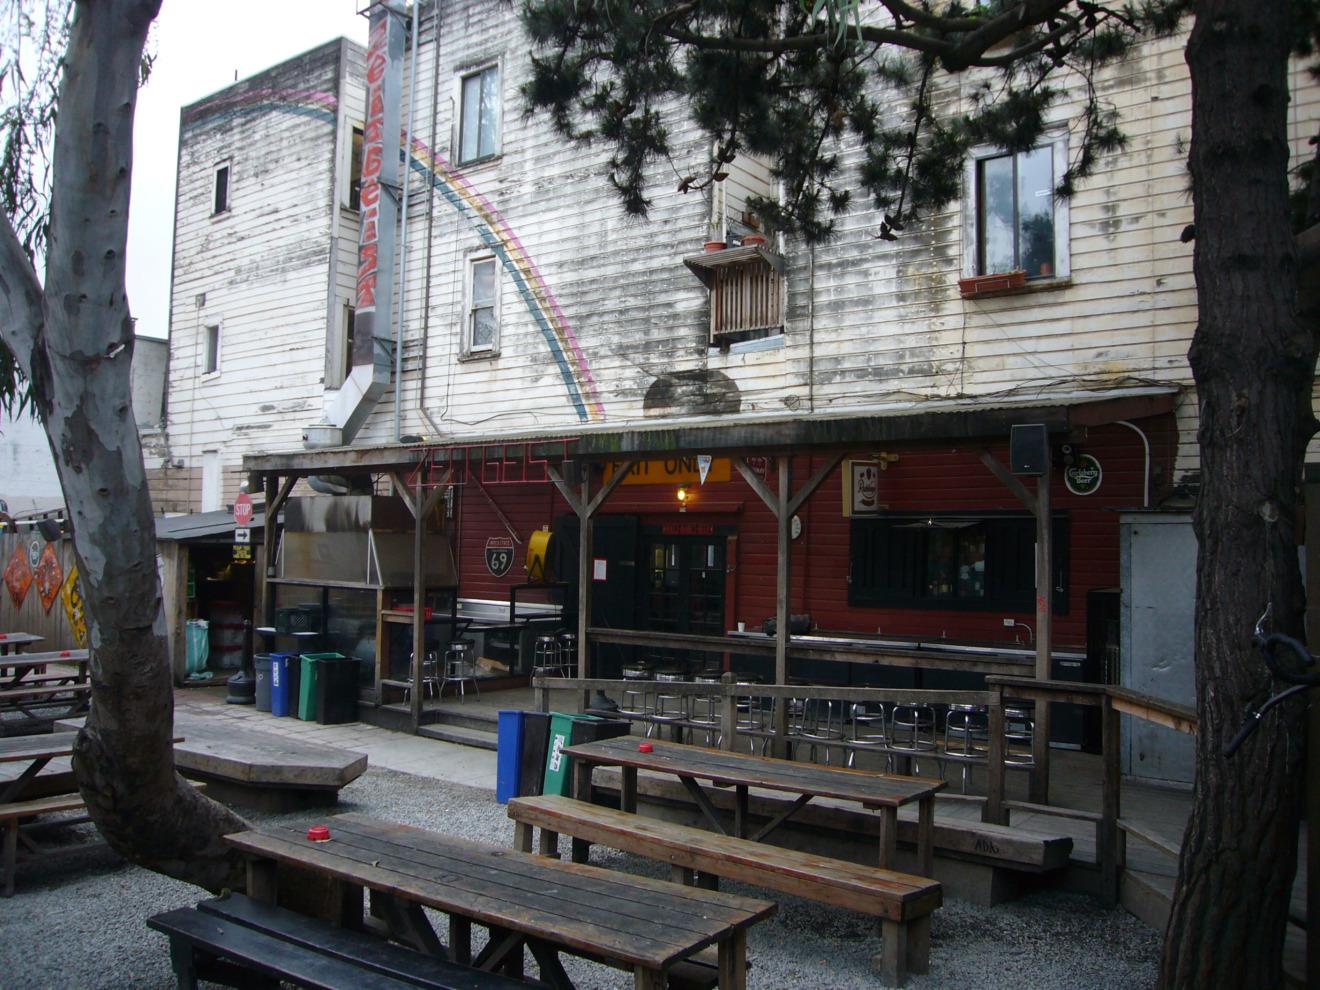 Zeitgeist San Francisco Nightlife Review 10best Experts